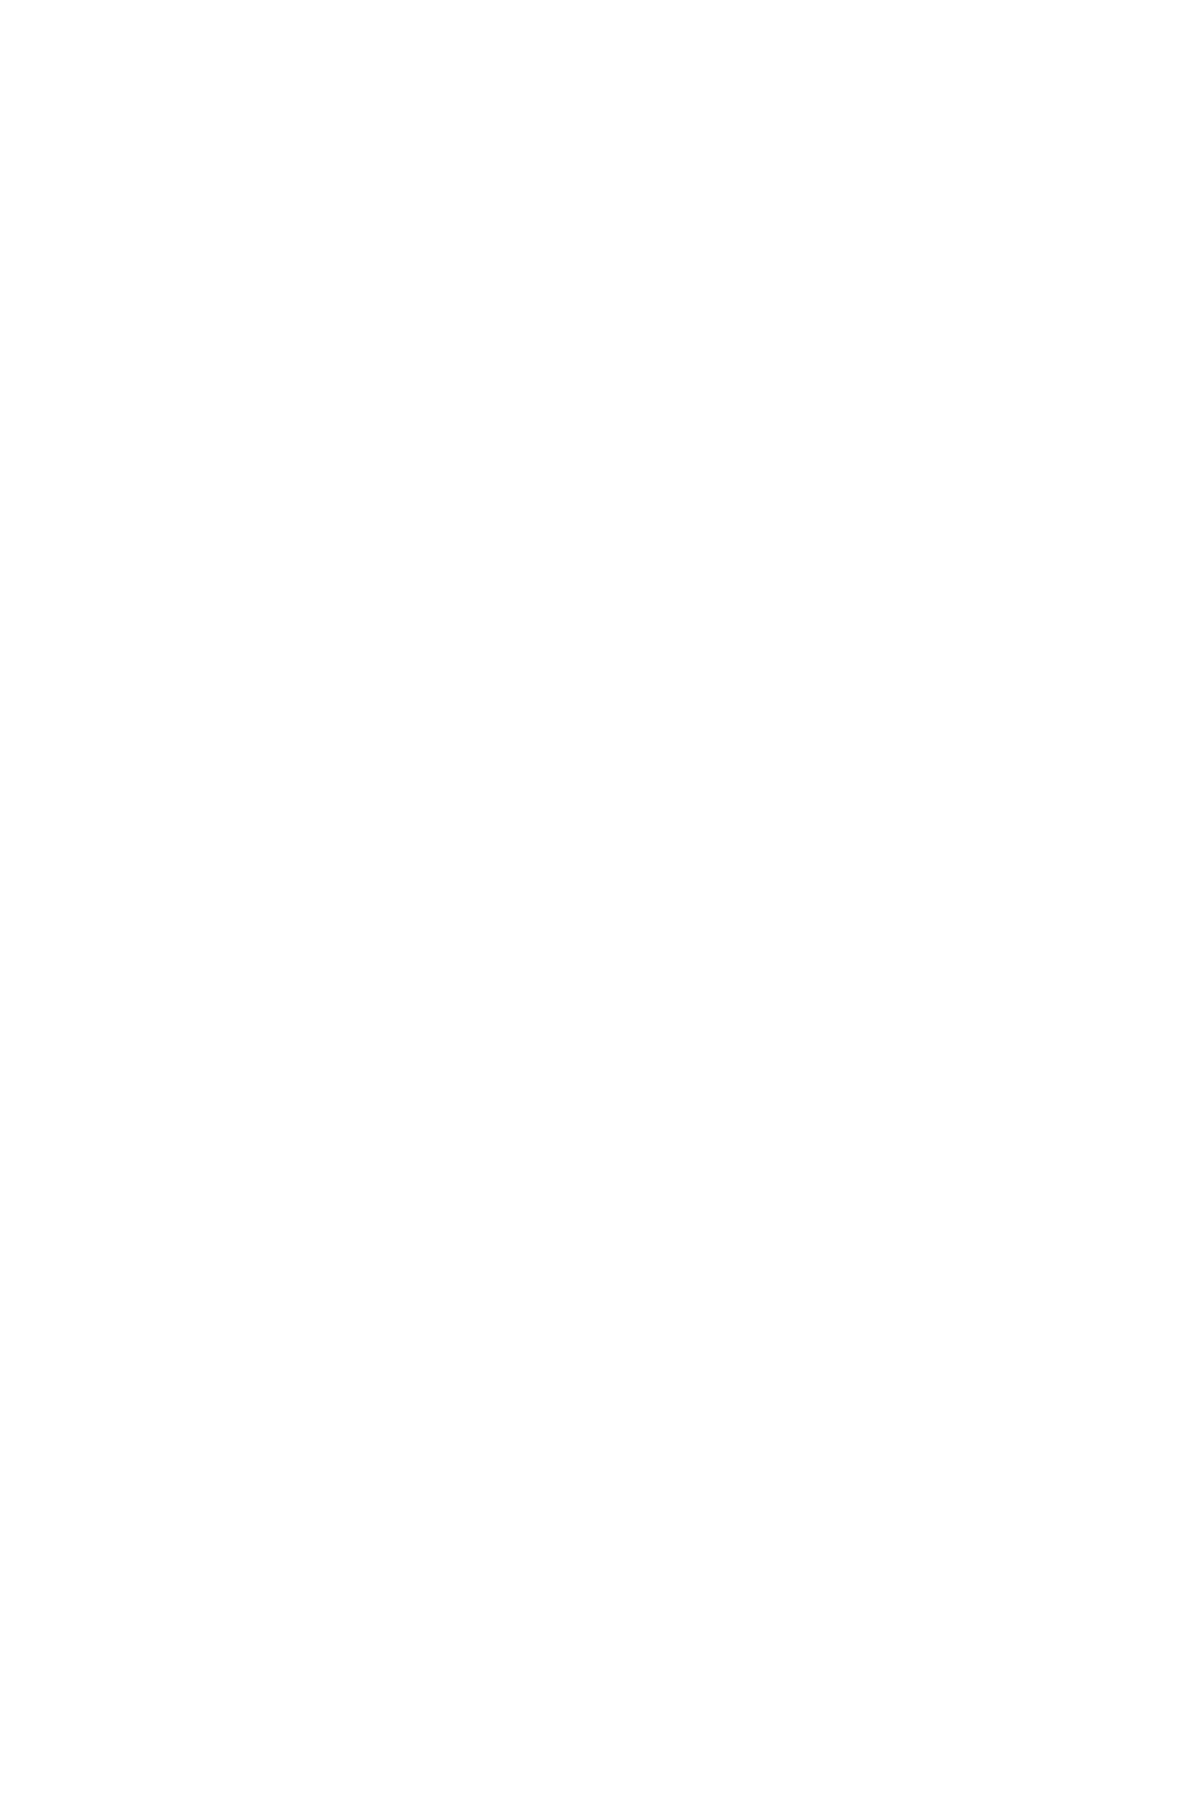 [Ando Hiroyuki] Koisuru Purin-Pai - Pudding-Pai Falling in Love [English] [Kusanyagi, Team Vanilla] 4